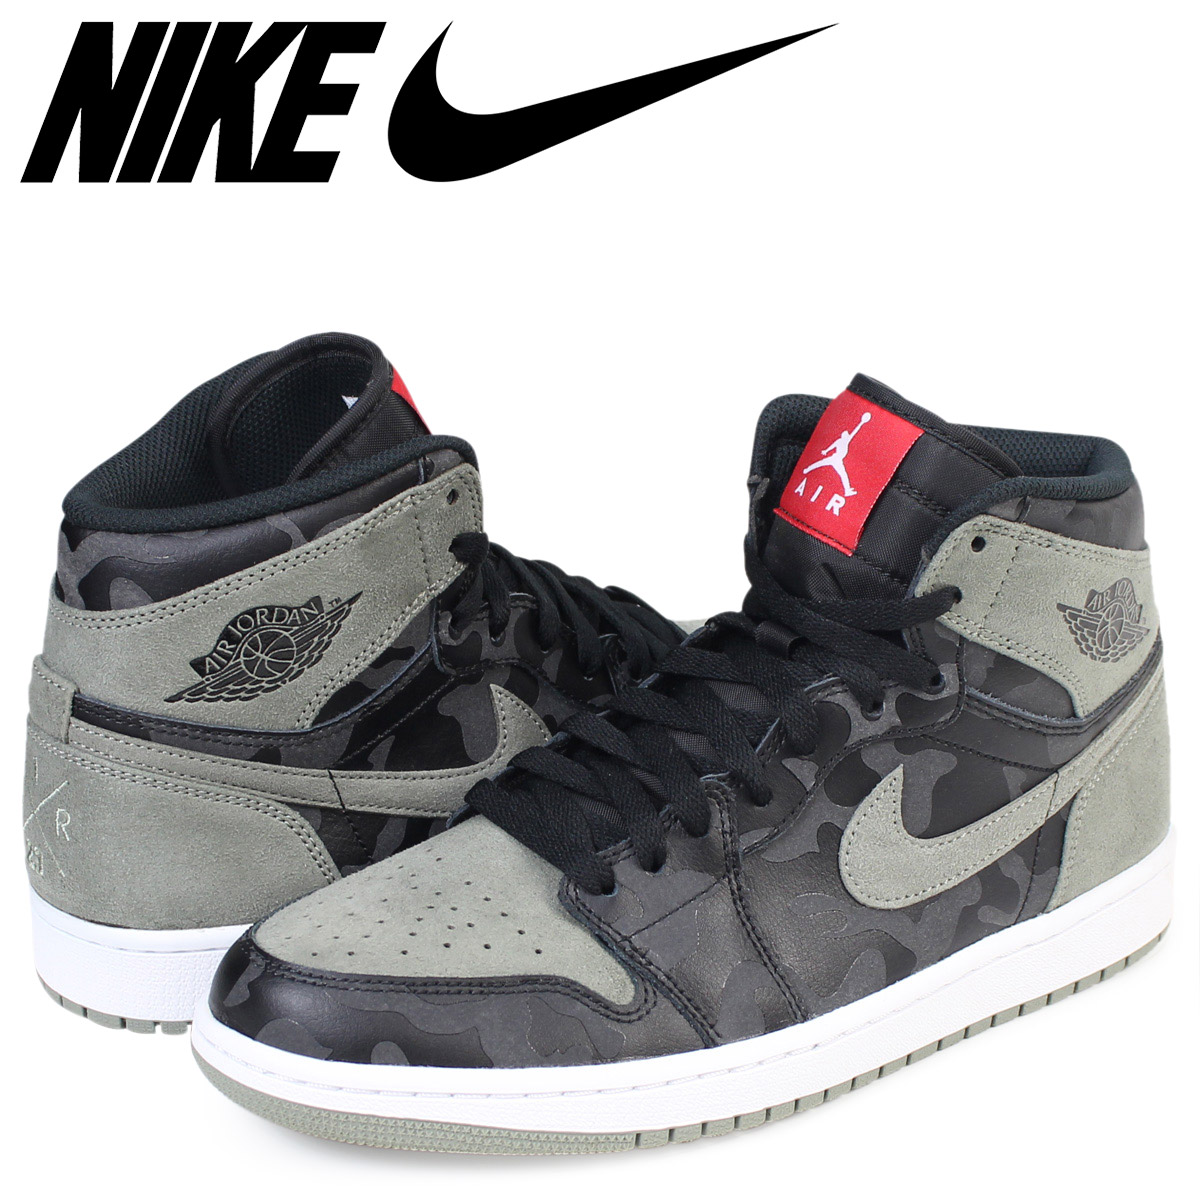 f374418bb54 Whats up Sports: Nike NIKE Air Jordan 1 nostalgic high sneakers AIR JORDAN  1 RETRO HIGH PREMIUM AA3993-034 men shoes black [load planned Shinnyu load  in ...